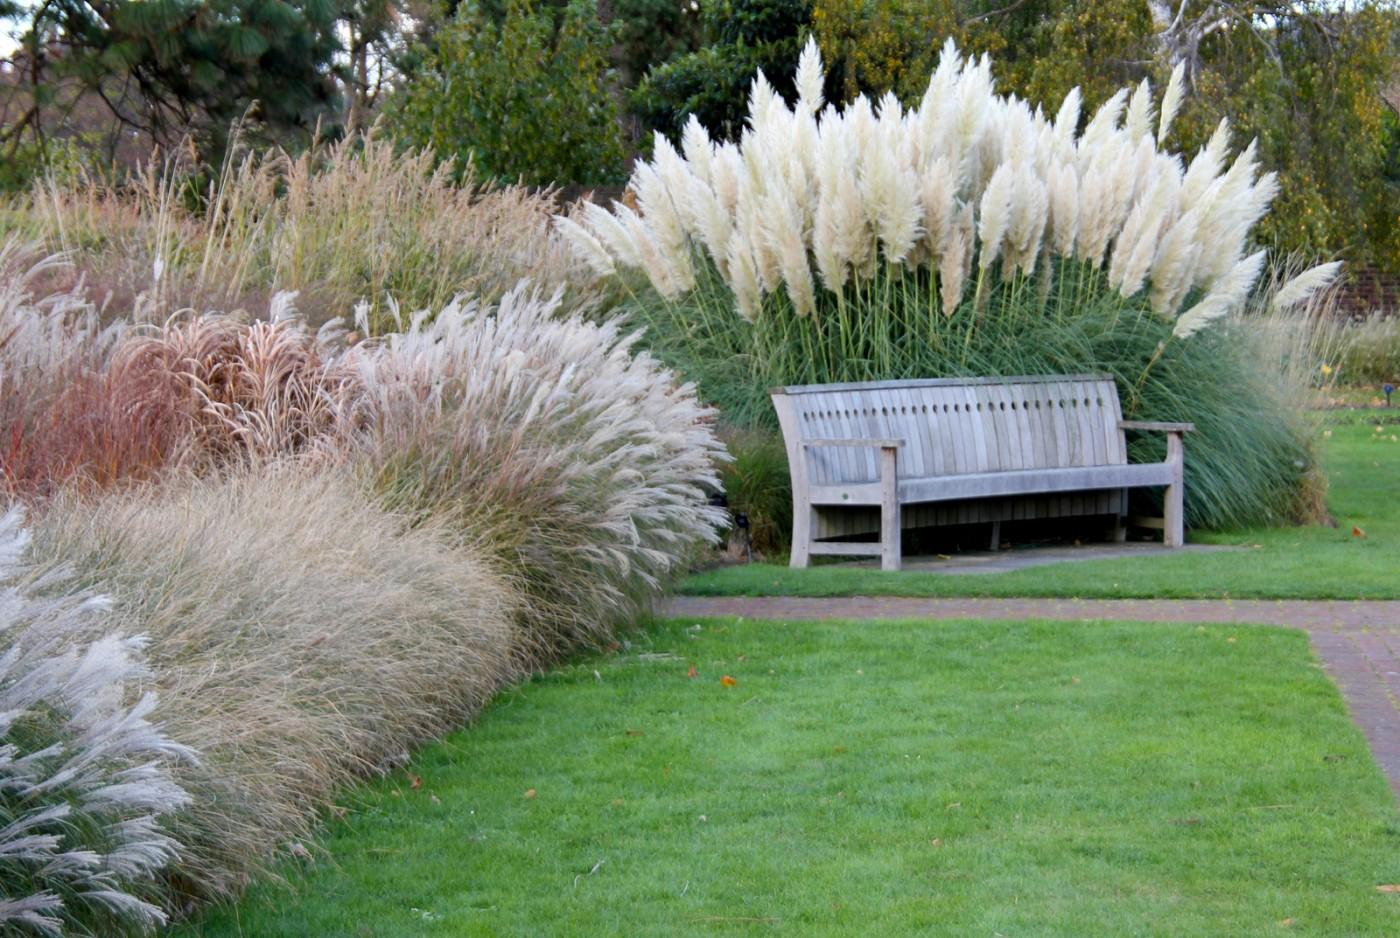 lawn Ornamental grasses shutterstock_119821459